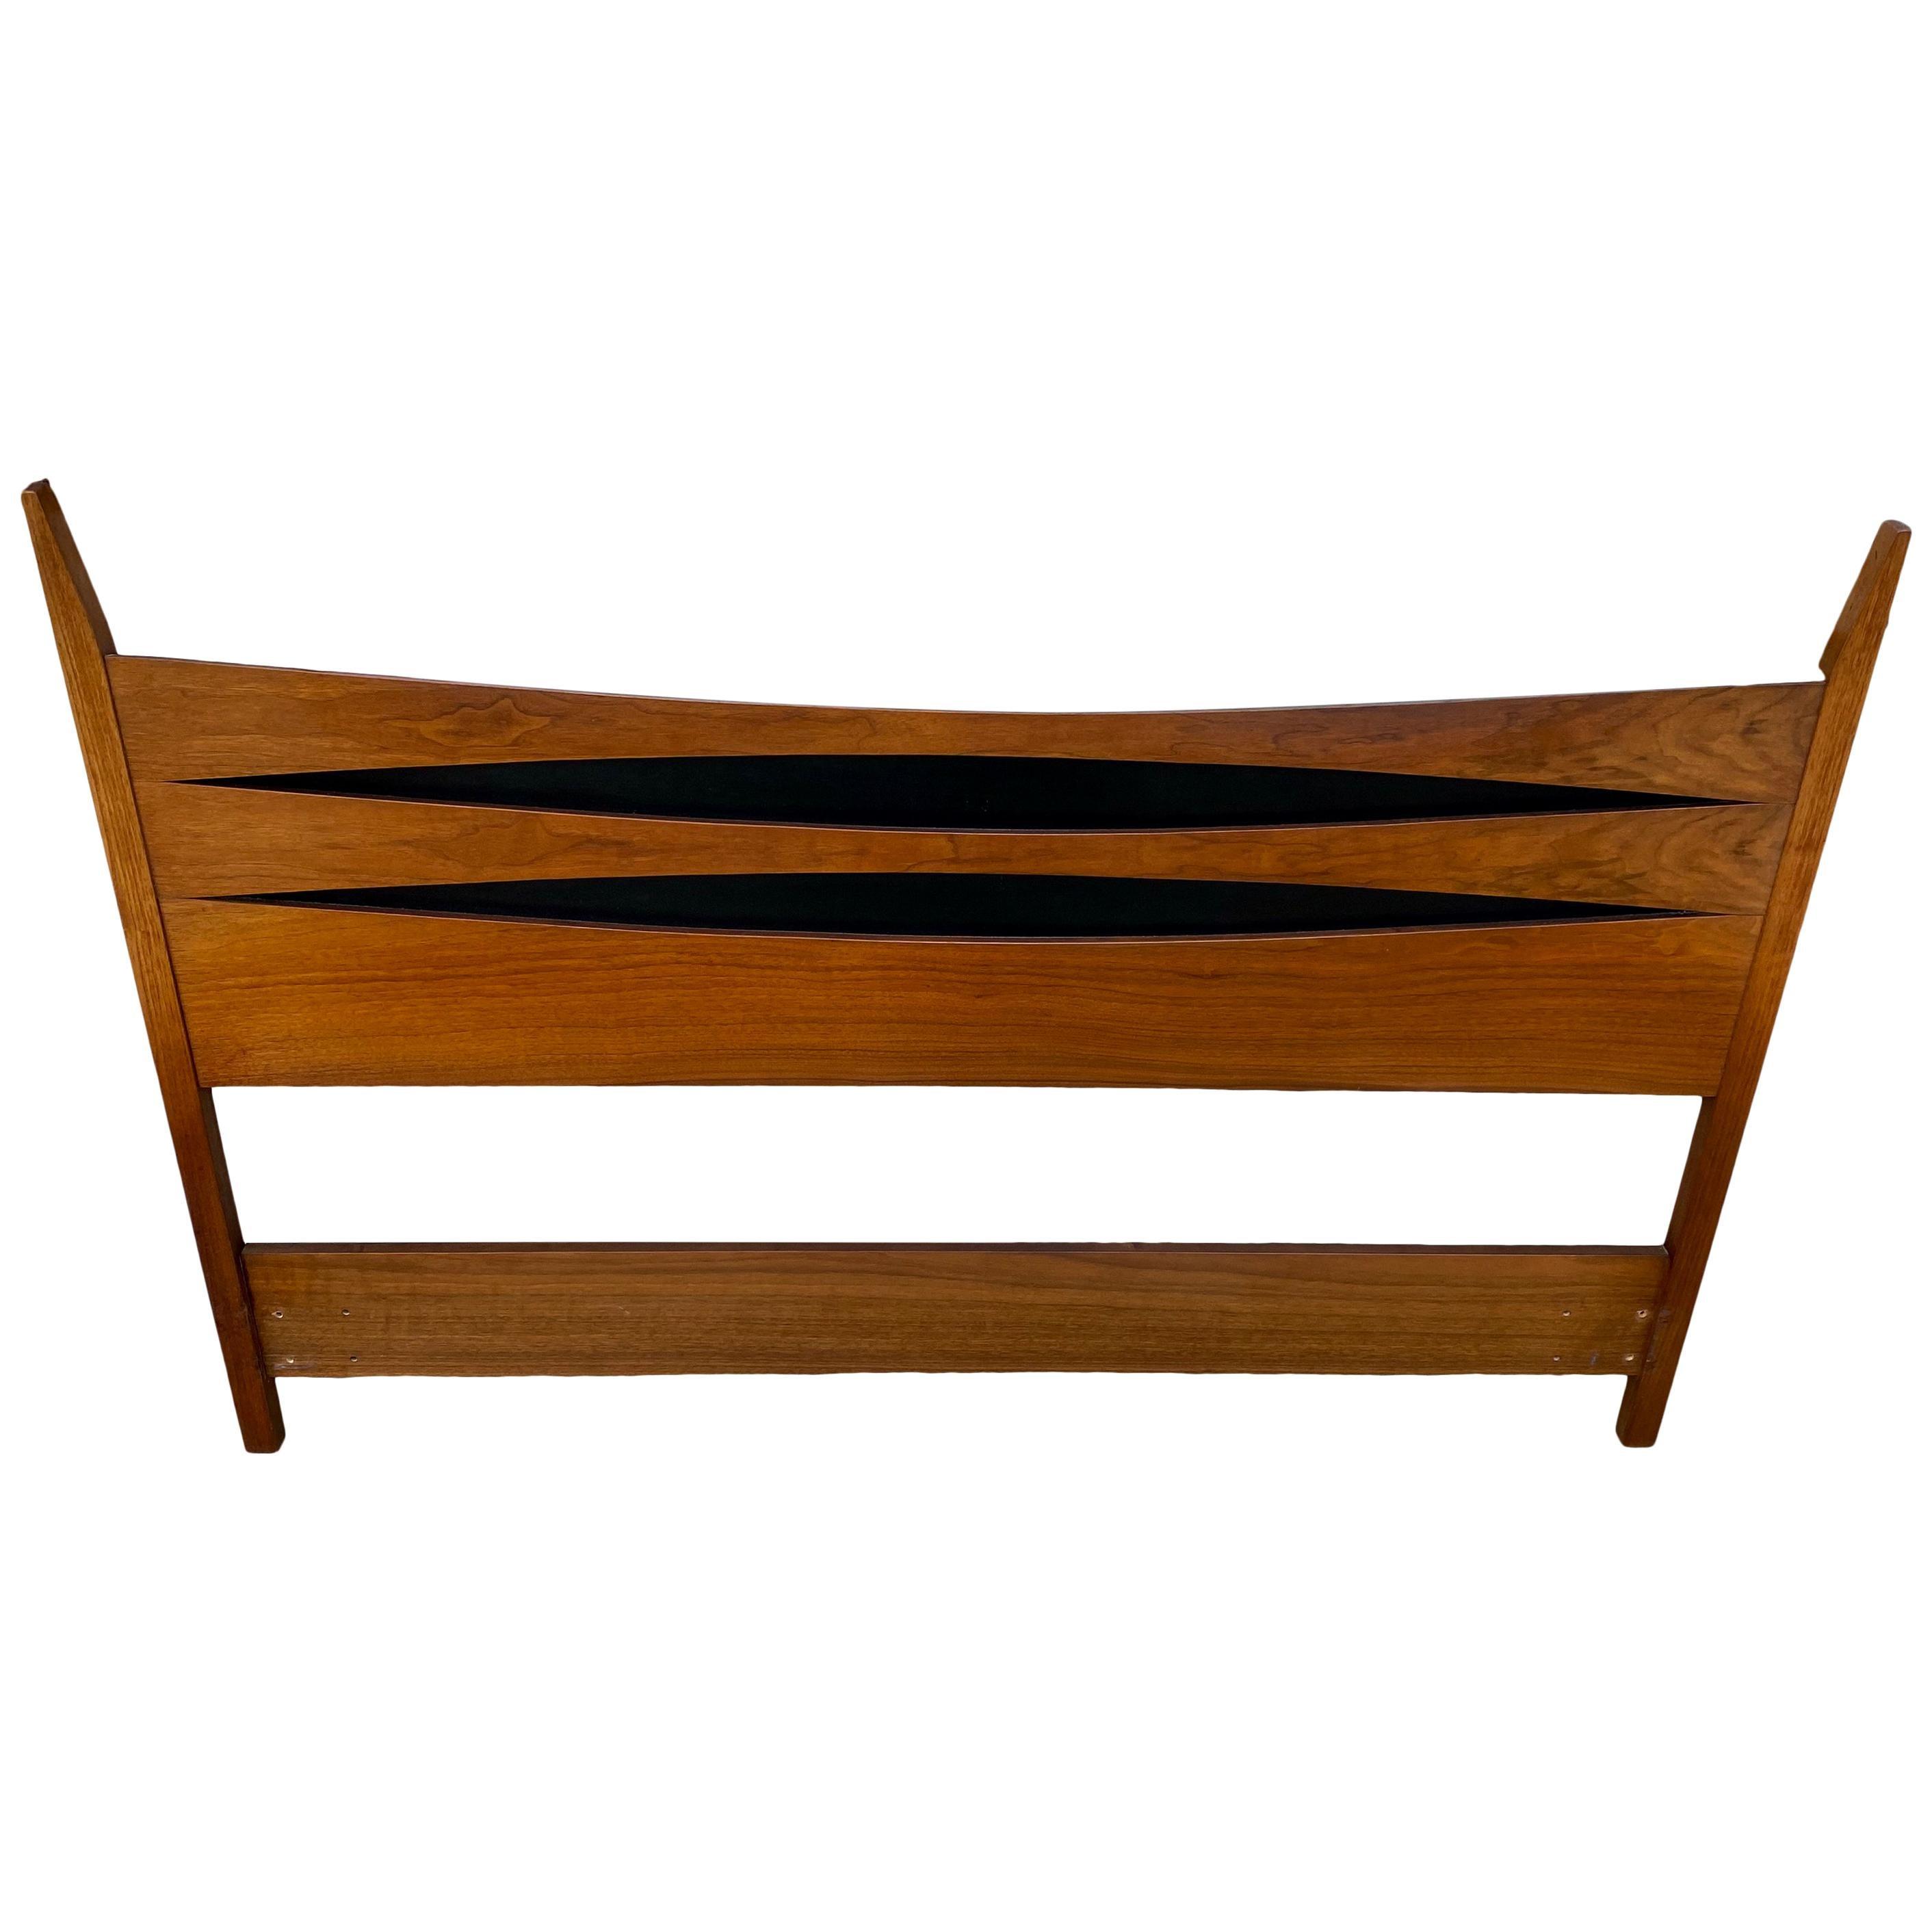 Mid-Century Modern Solid Walnut Queen Bed Headboard Style of Arne Vodder